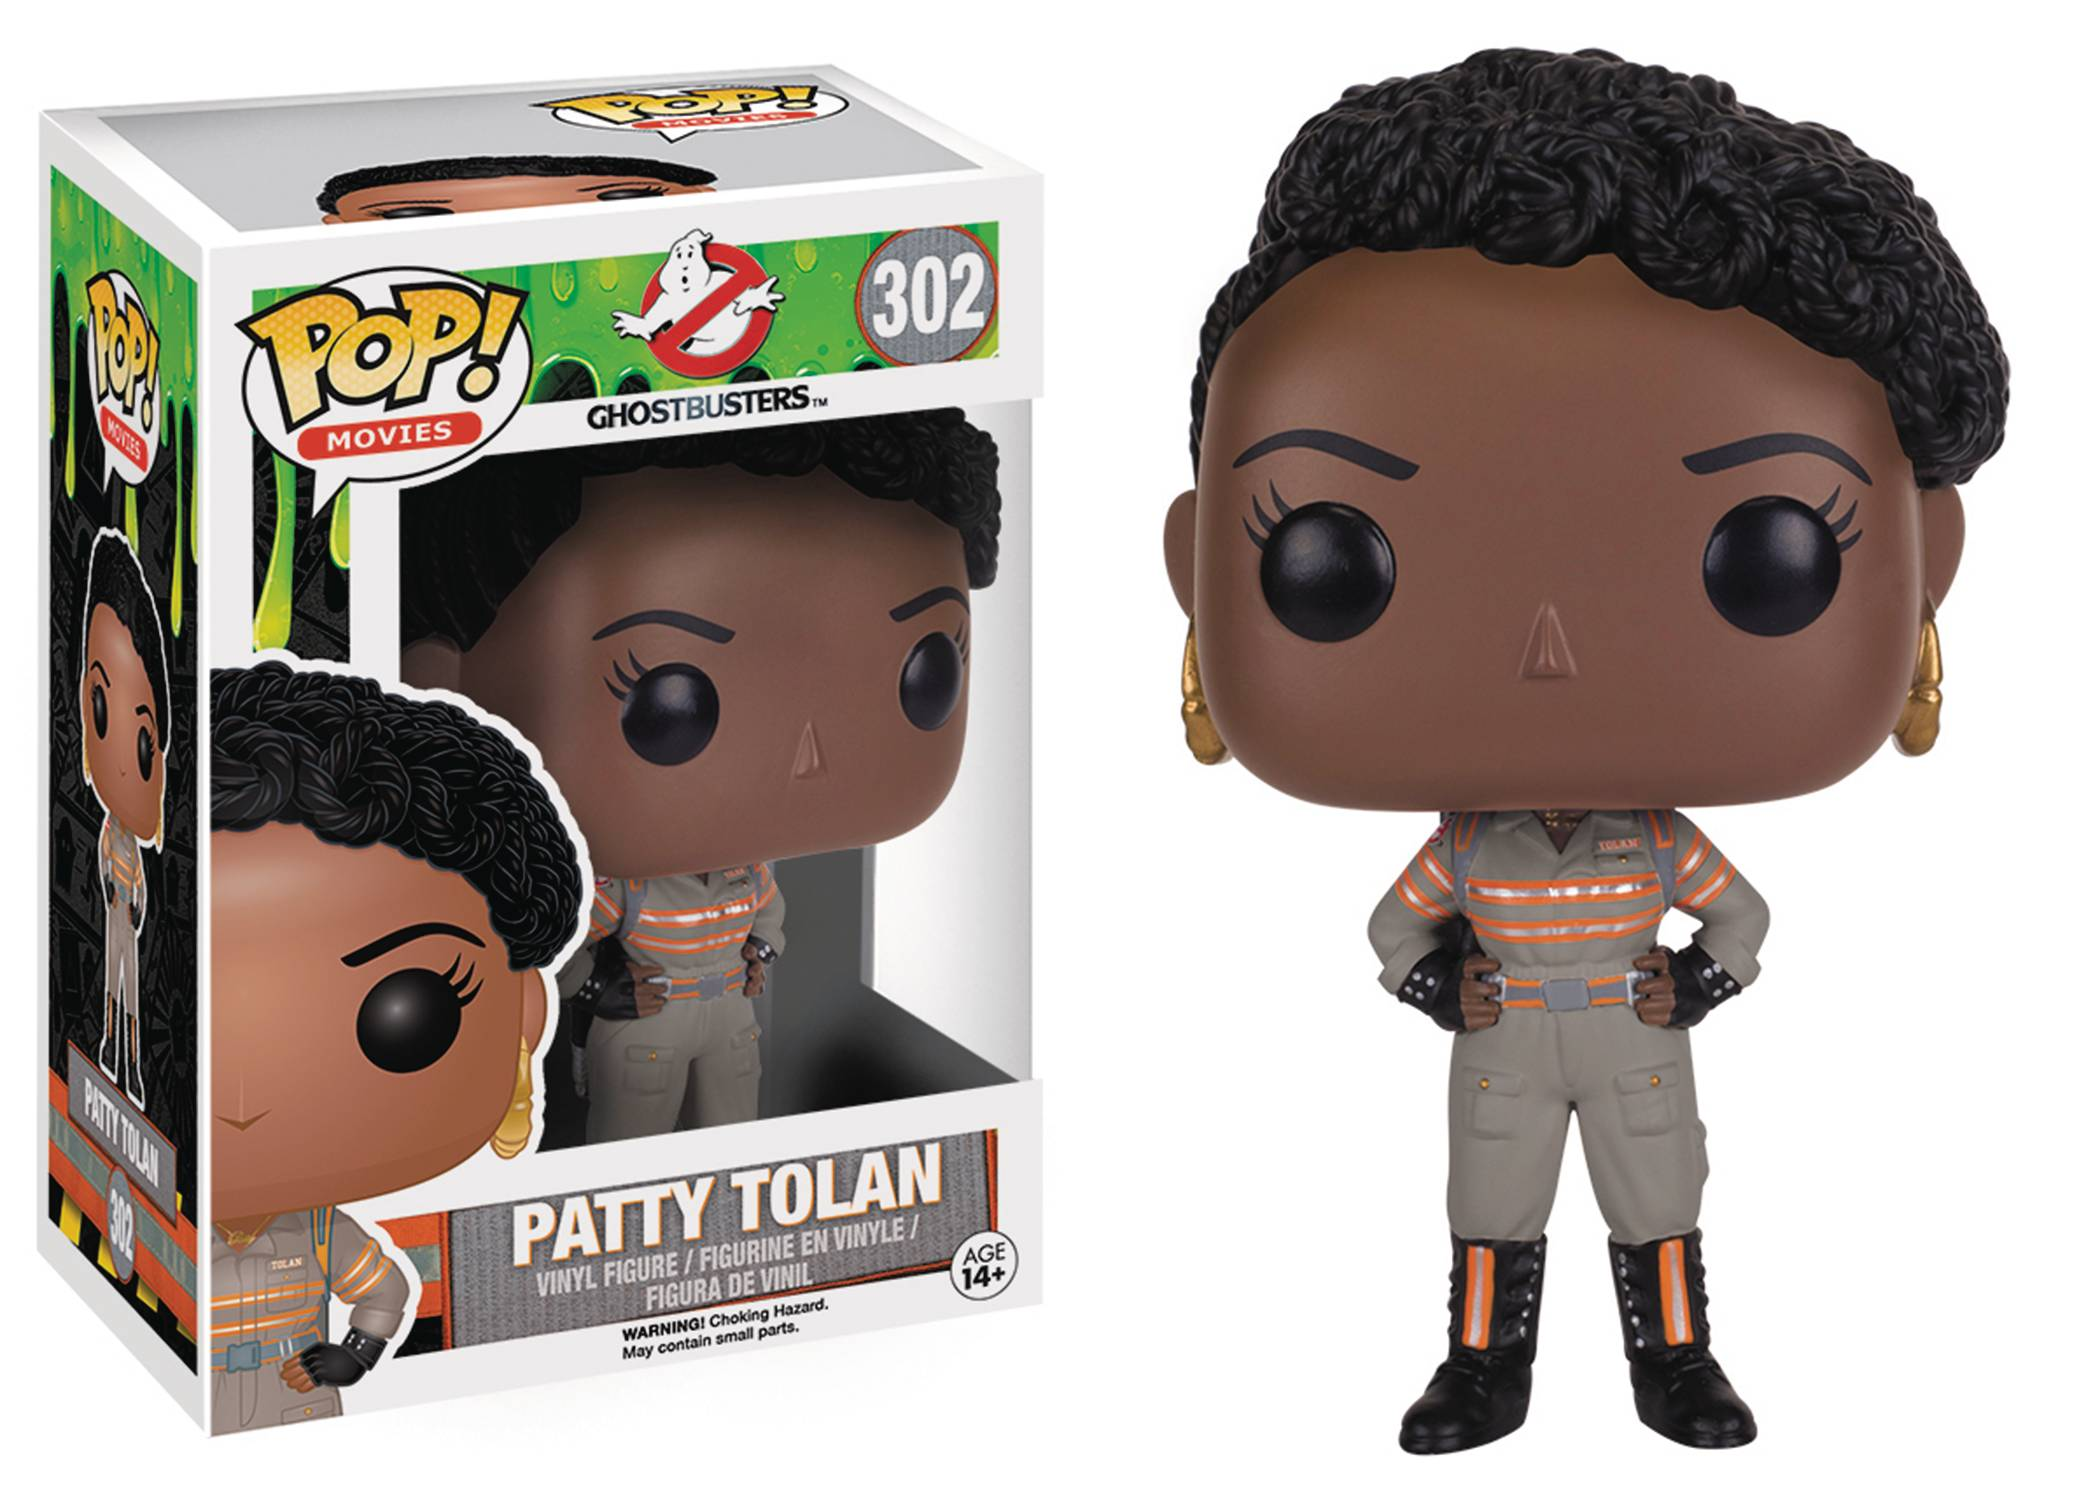 POP Ghostbusters 2016 Patty Tolan Vinyl Fig